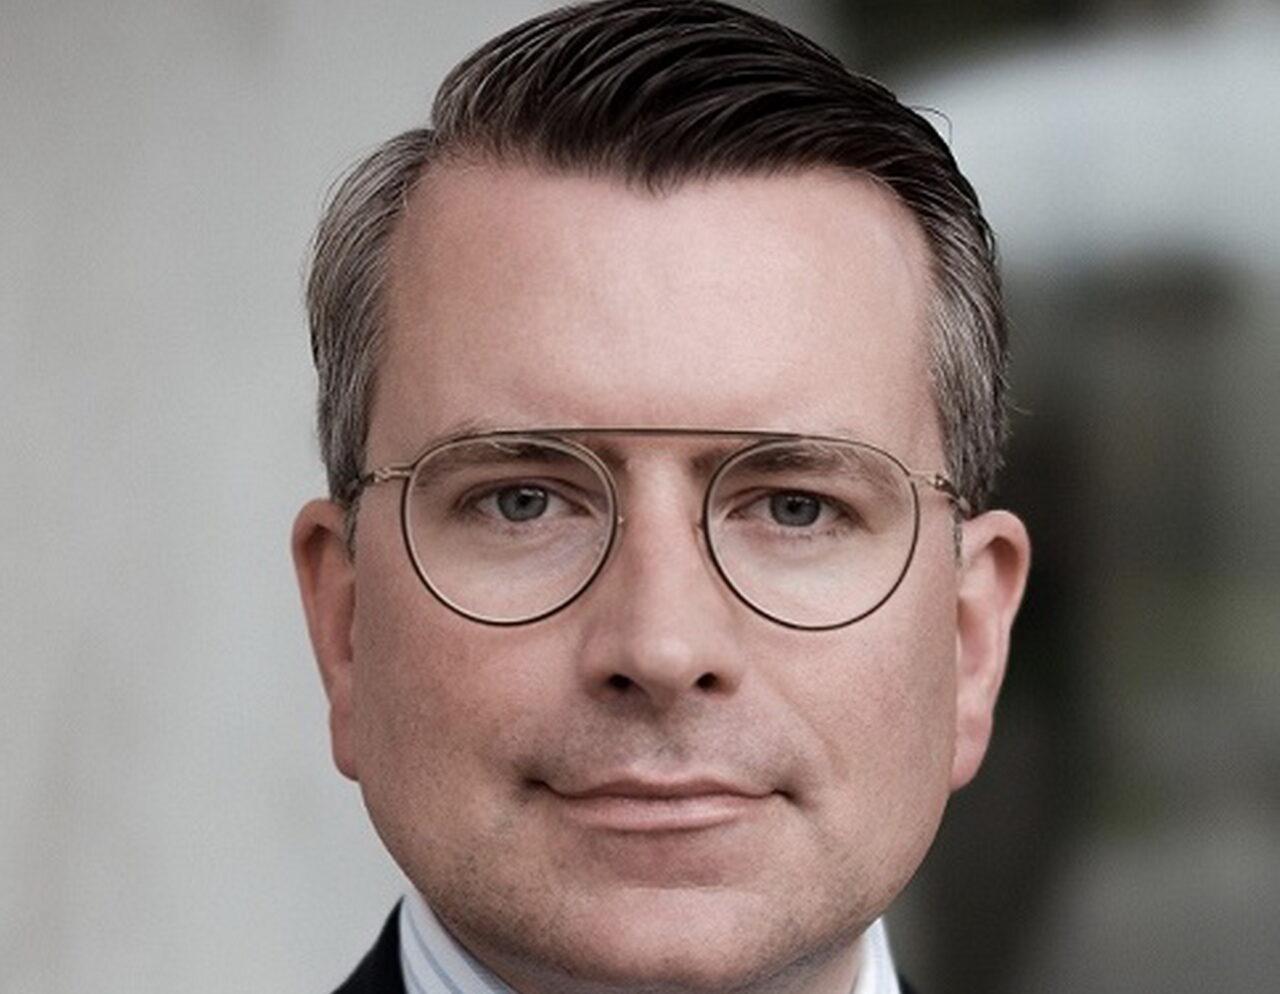 https://intelligent-investors.de/wp-content/uploads/2020/10/Daniel-Pahl_2-1280x994.jpg